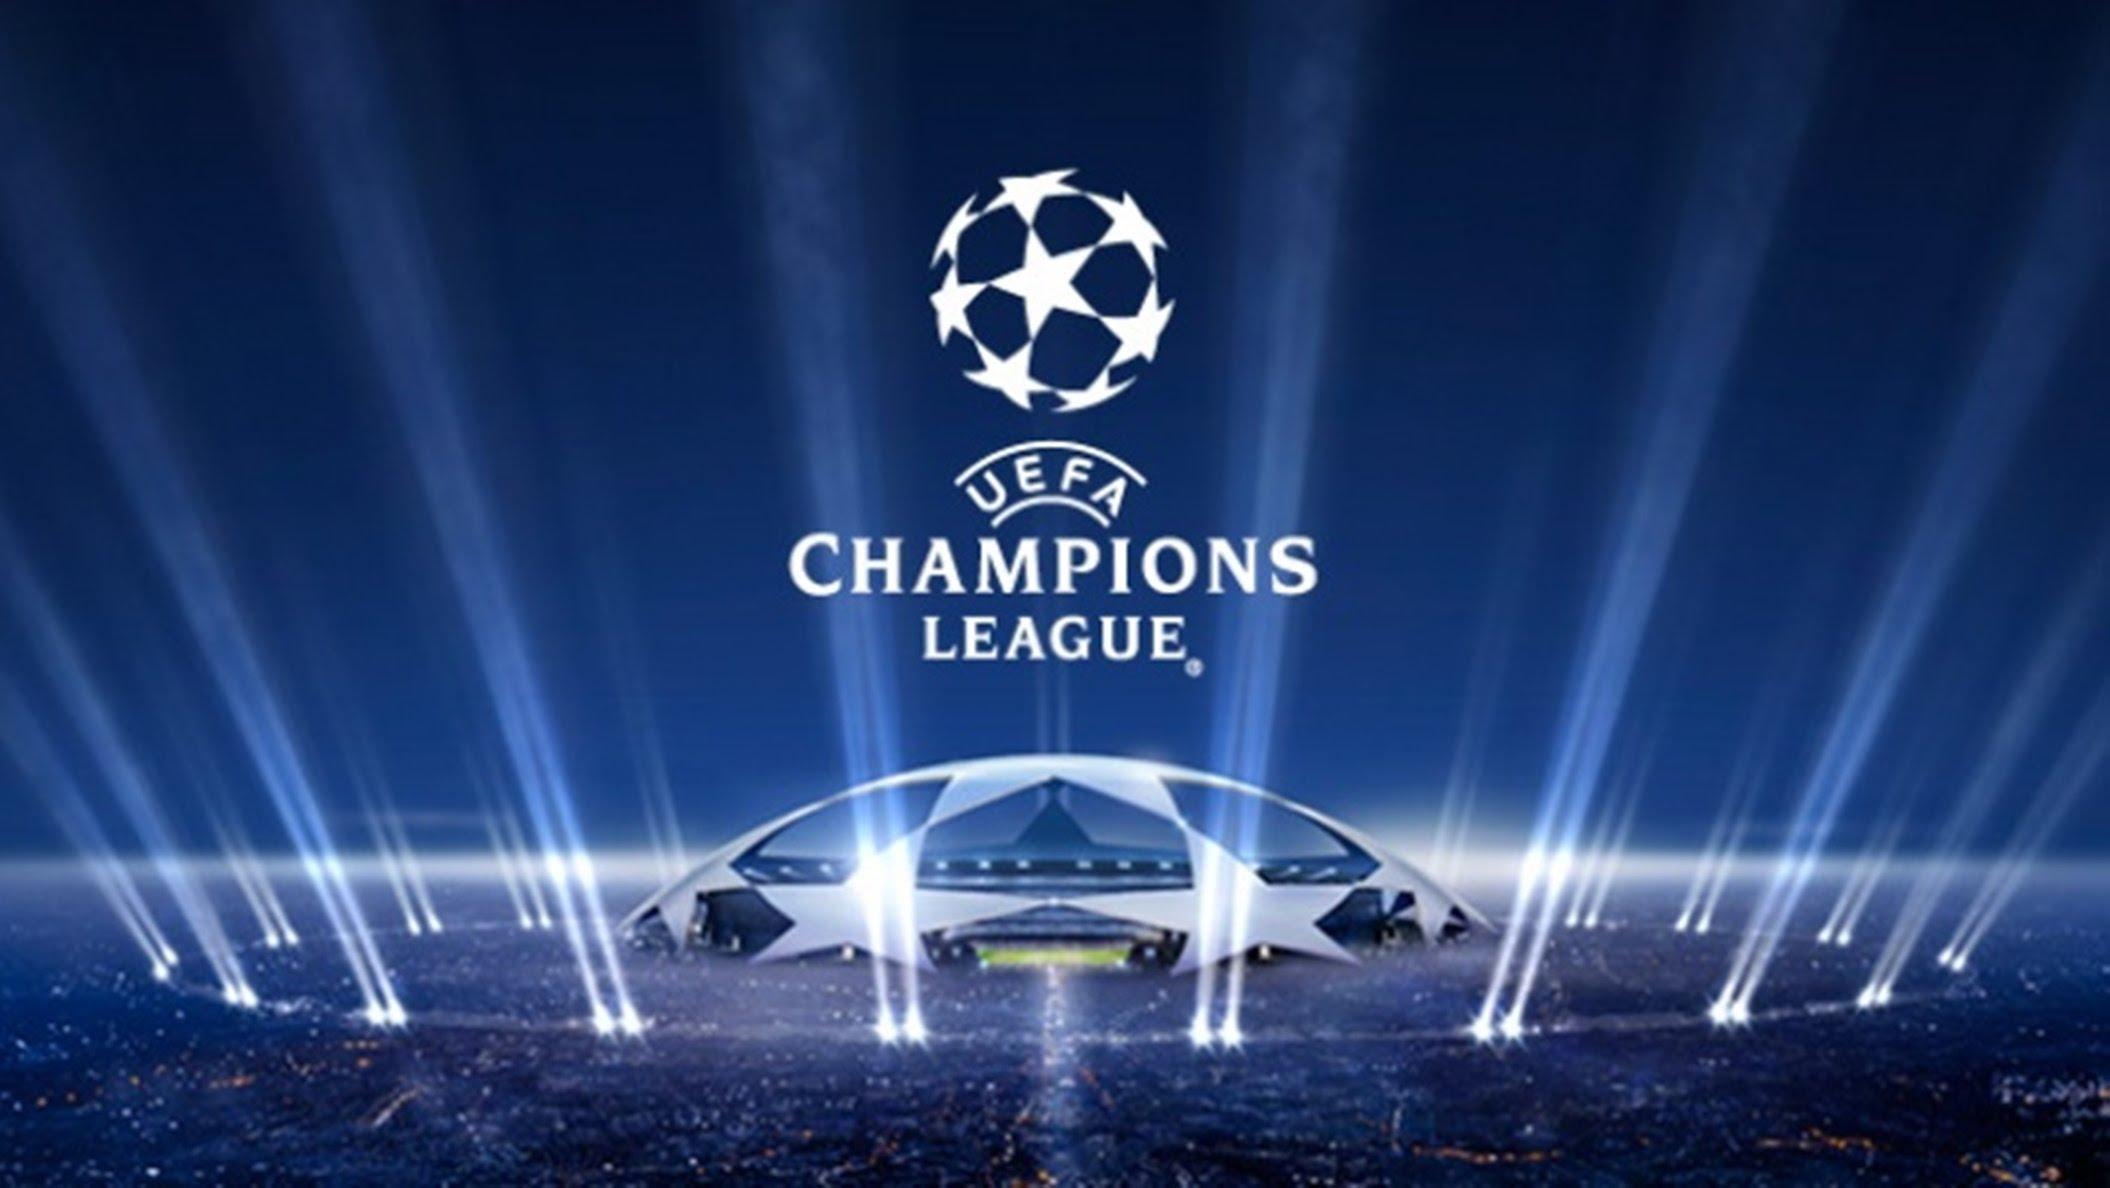 champions league - Tv. Mediaset cede: la Champions sarà sui canali free